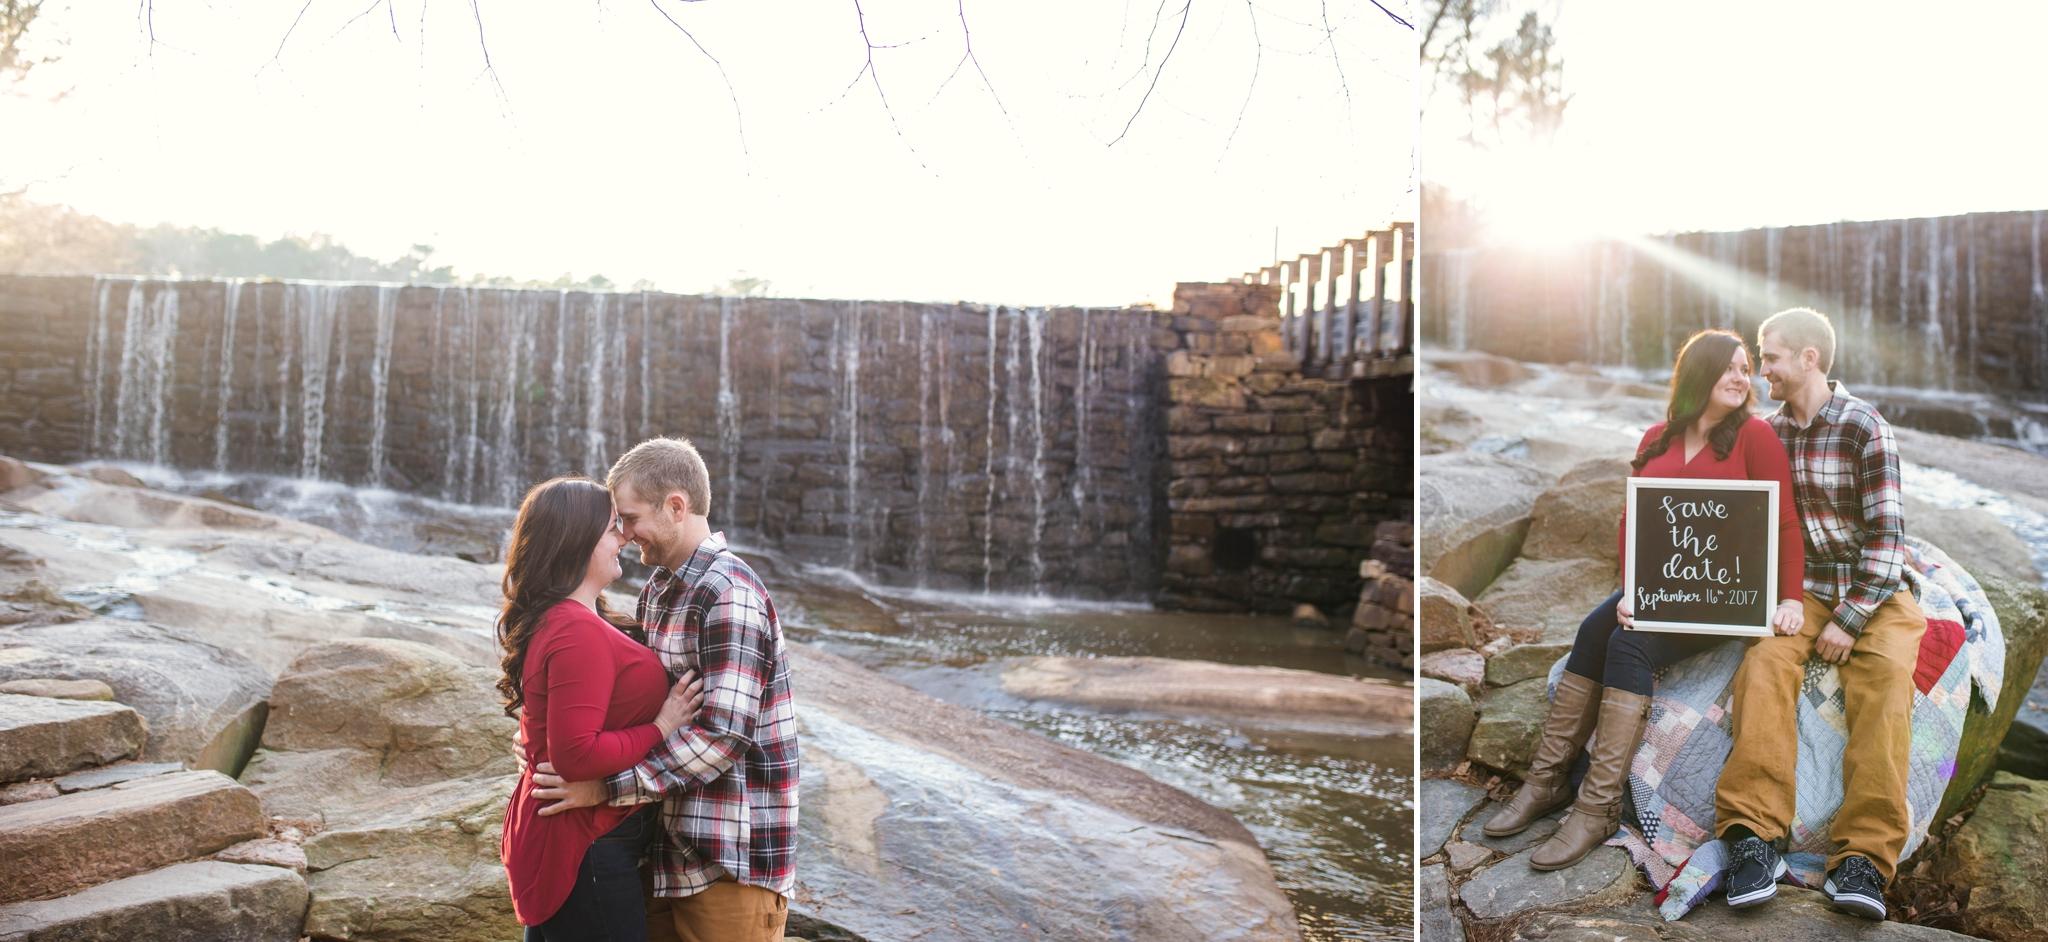 Raleigh Engagement Photographer at Yates Mill Park - Johanna Dye Photography - Dean Engagement